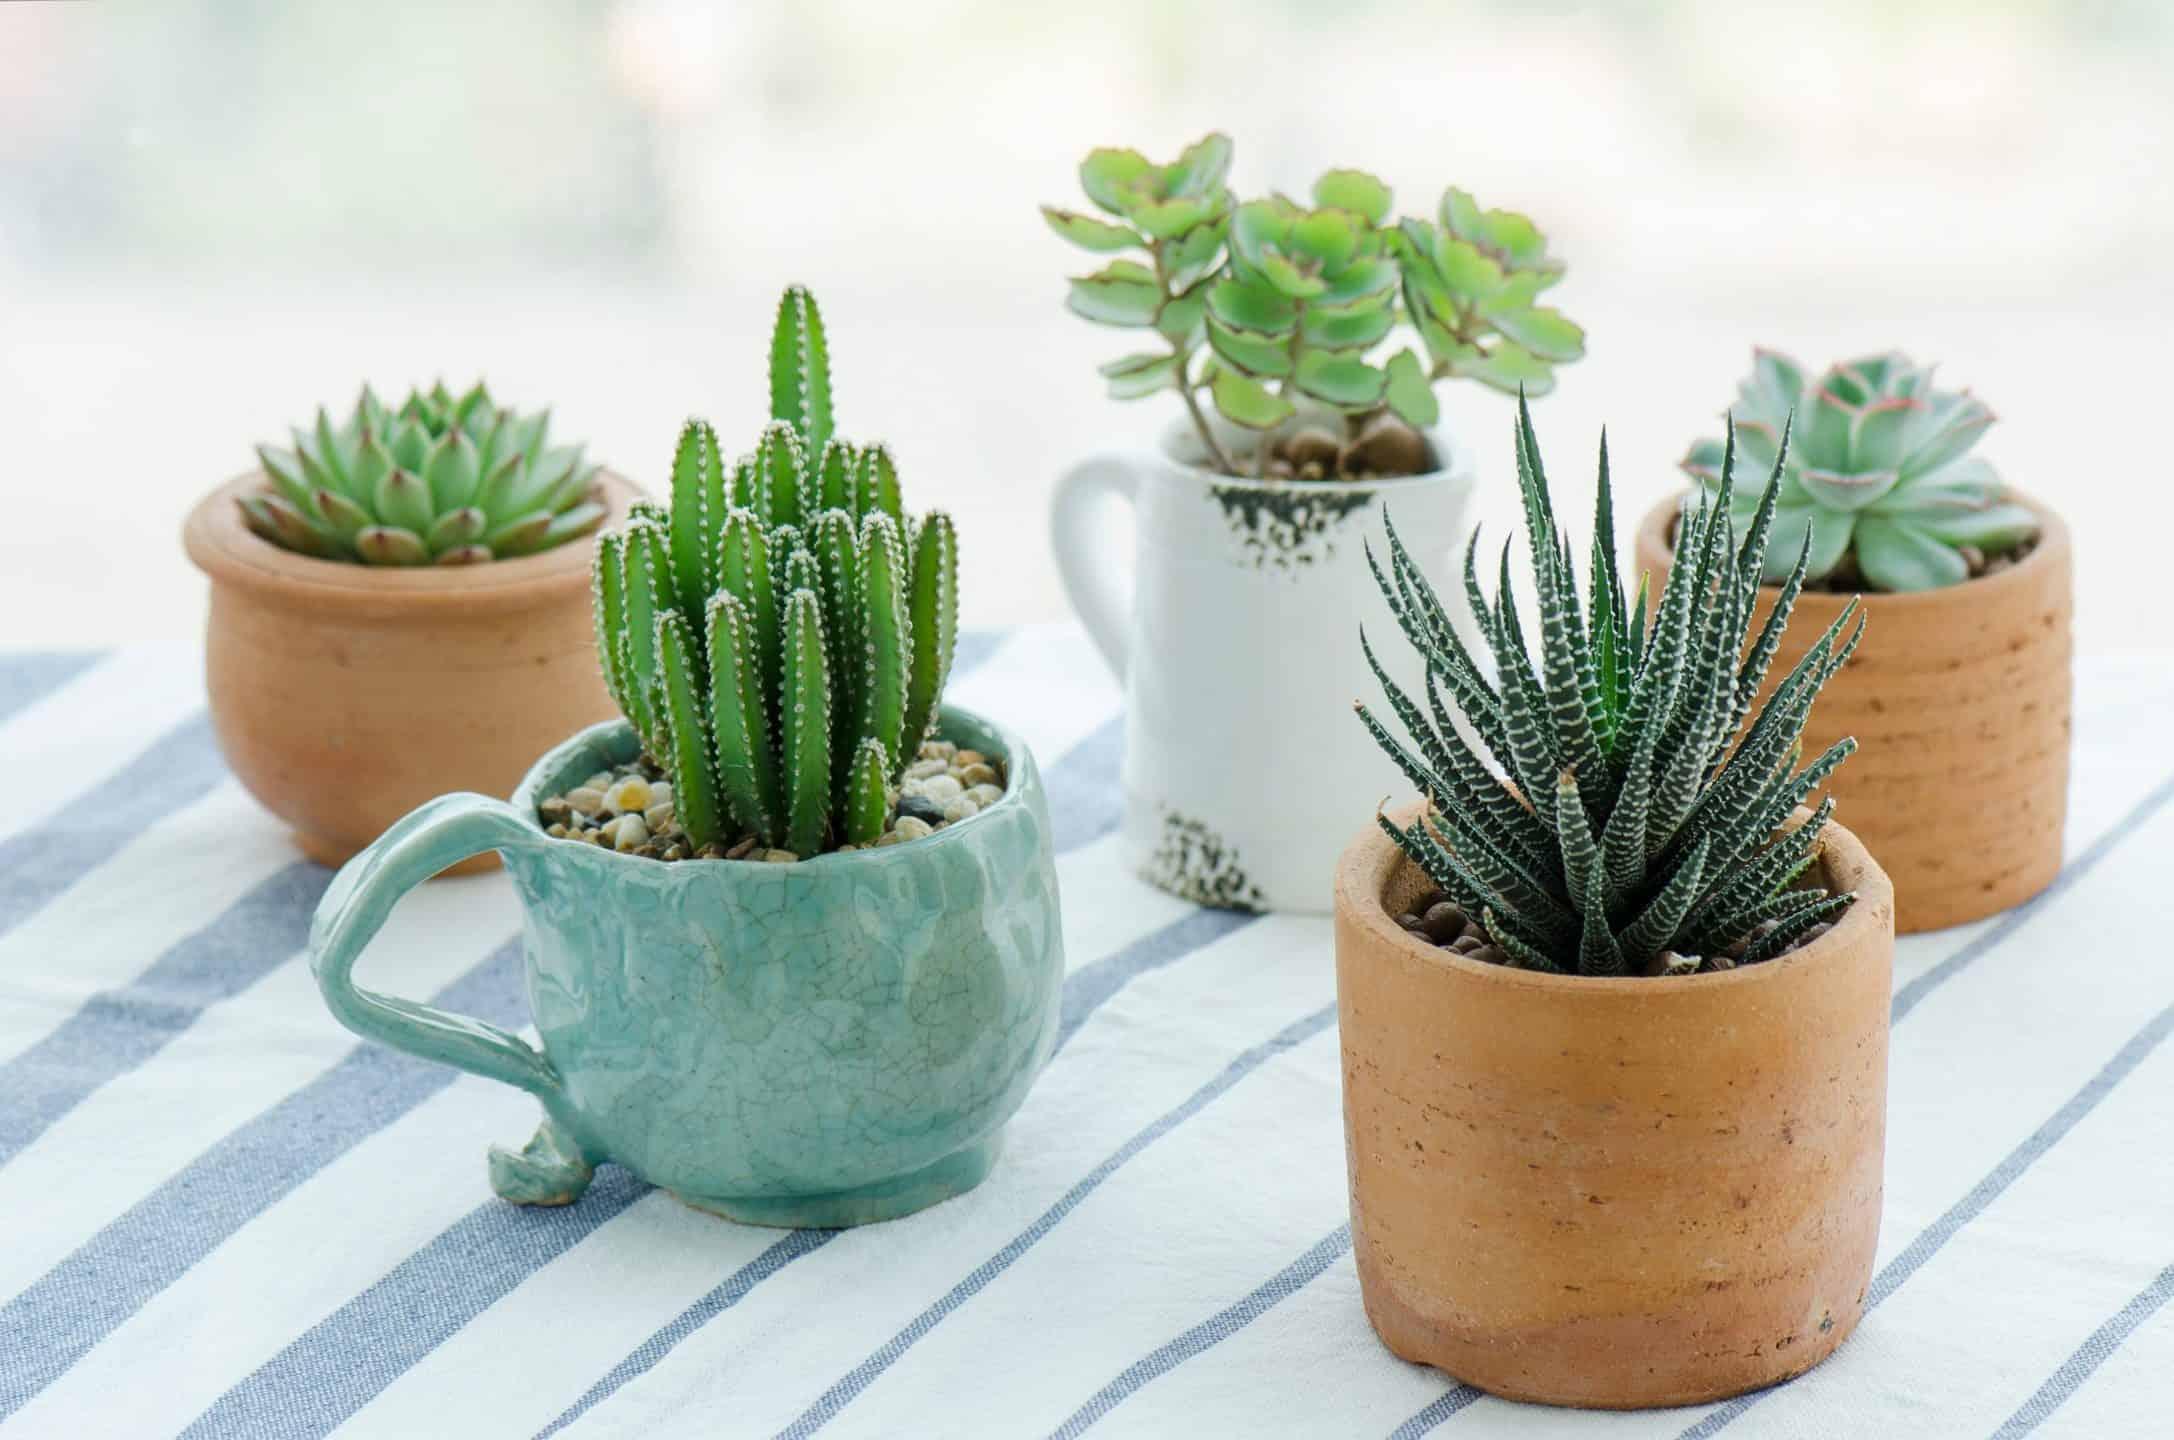 cactus-credit-panattar-shutterstock